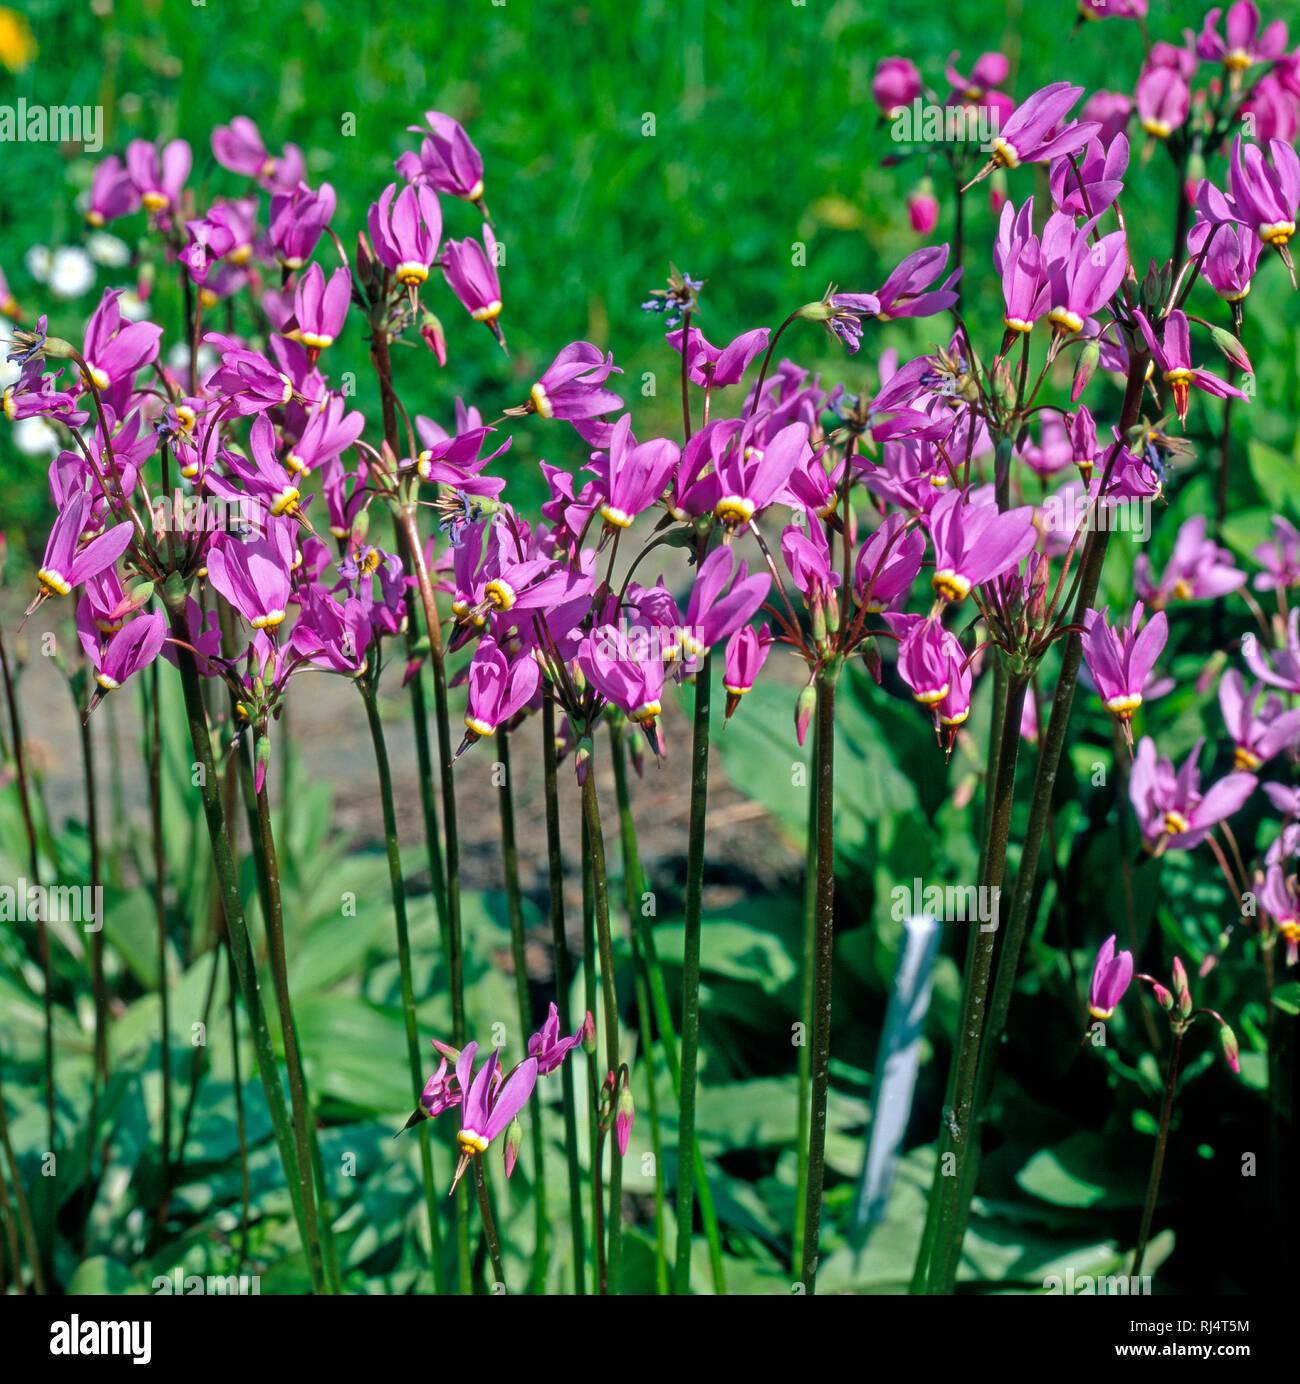 G?tterblumen aus Nordwestamerika im Gartenbeet - Stock Image